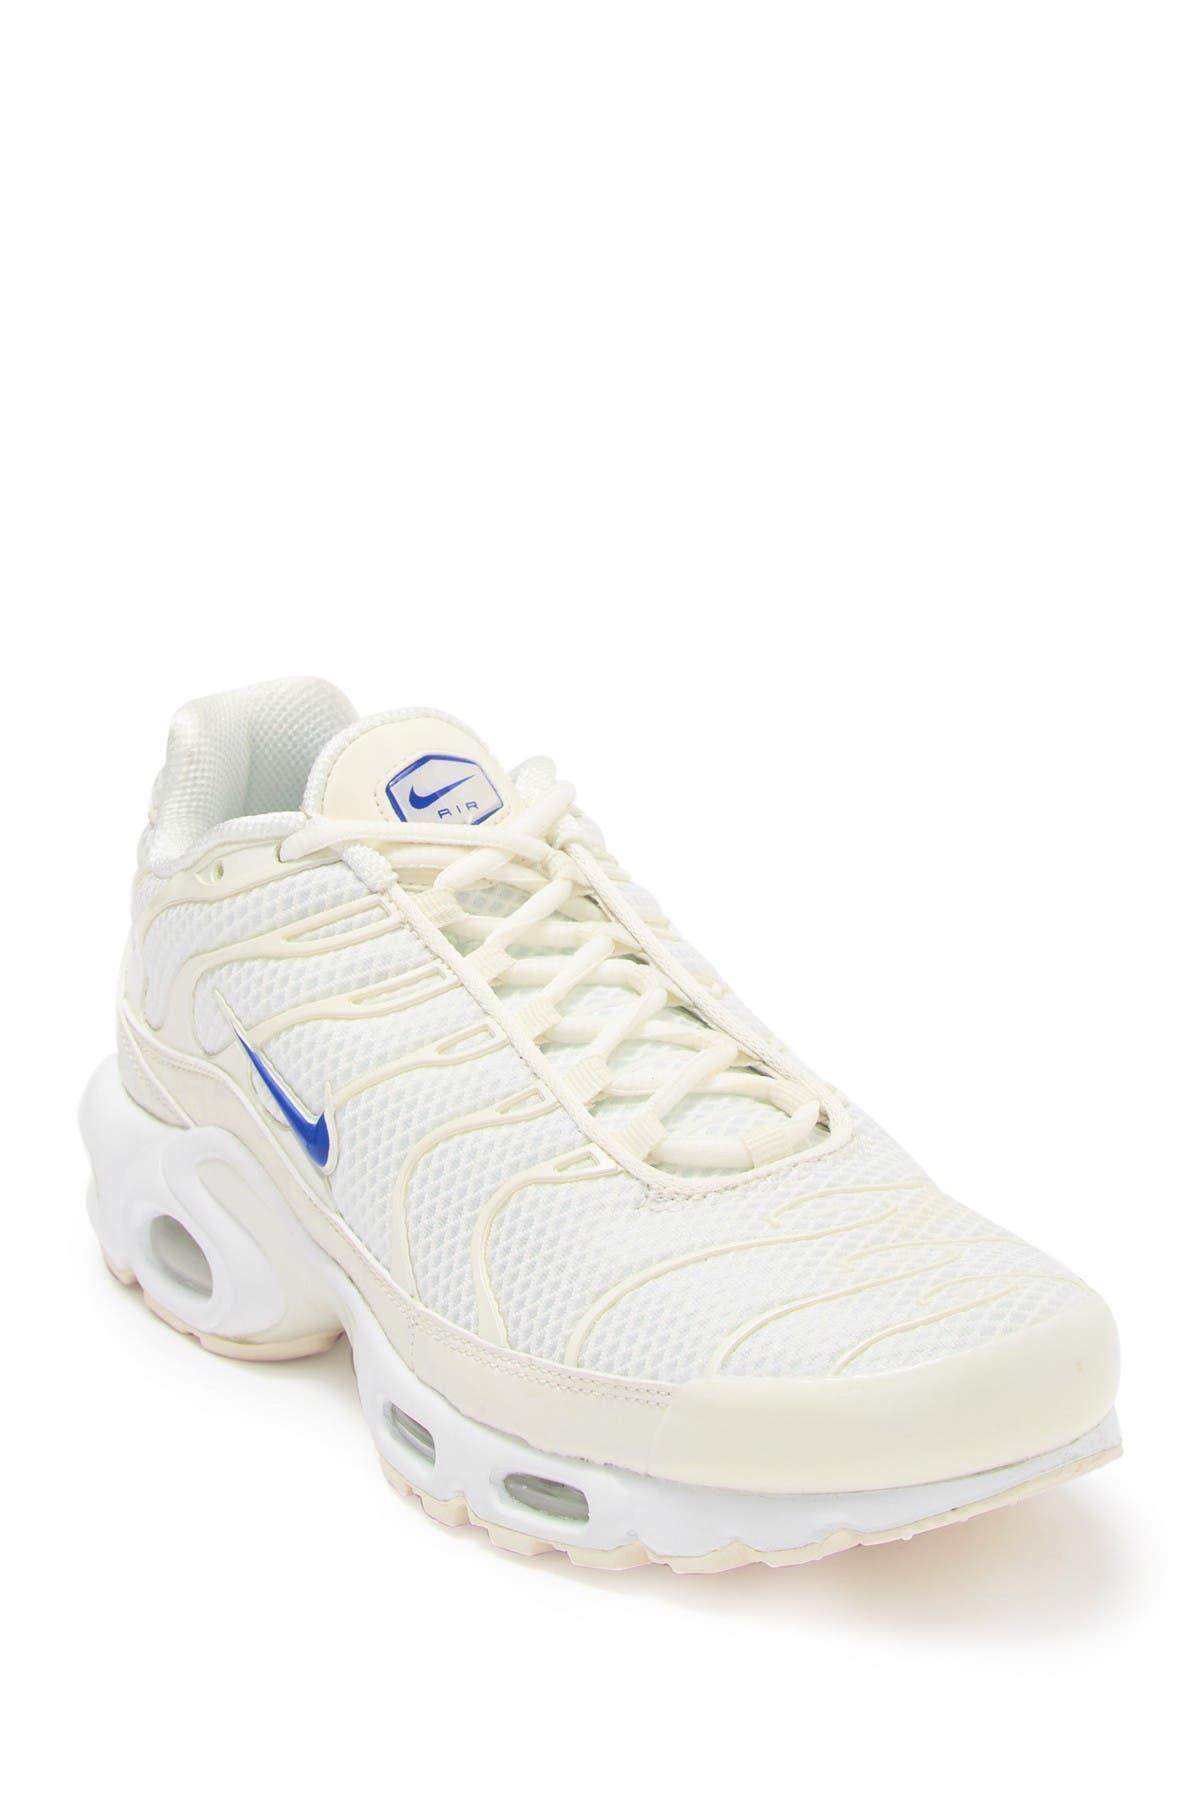 Nike   Air Max Plus TN SE Sneaker